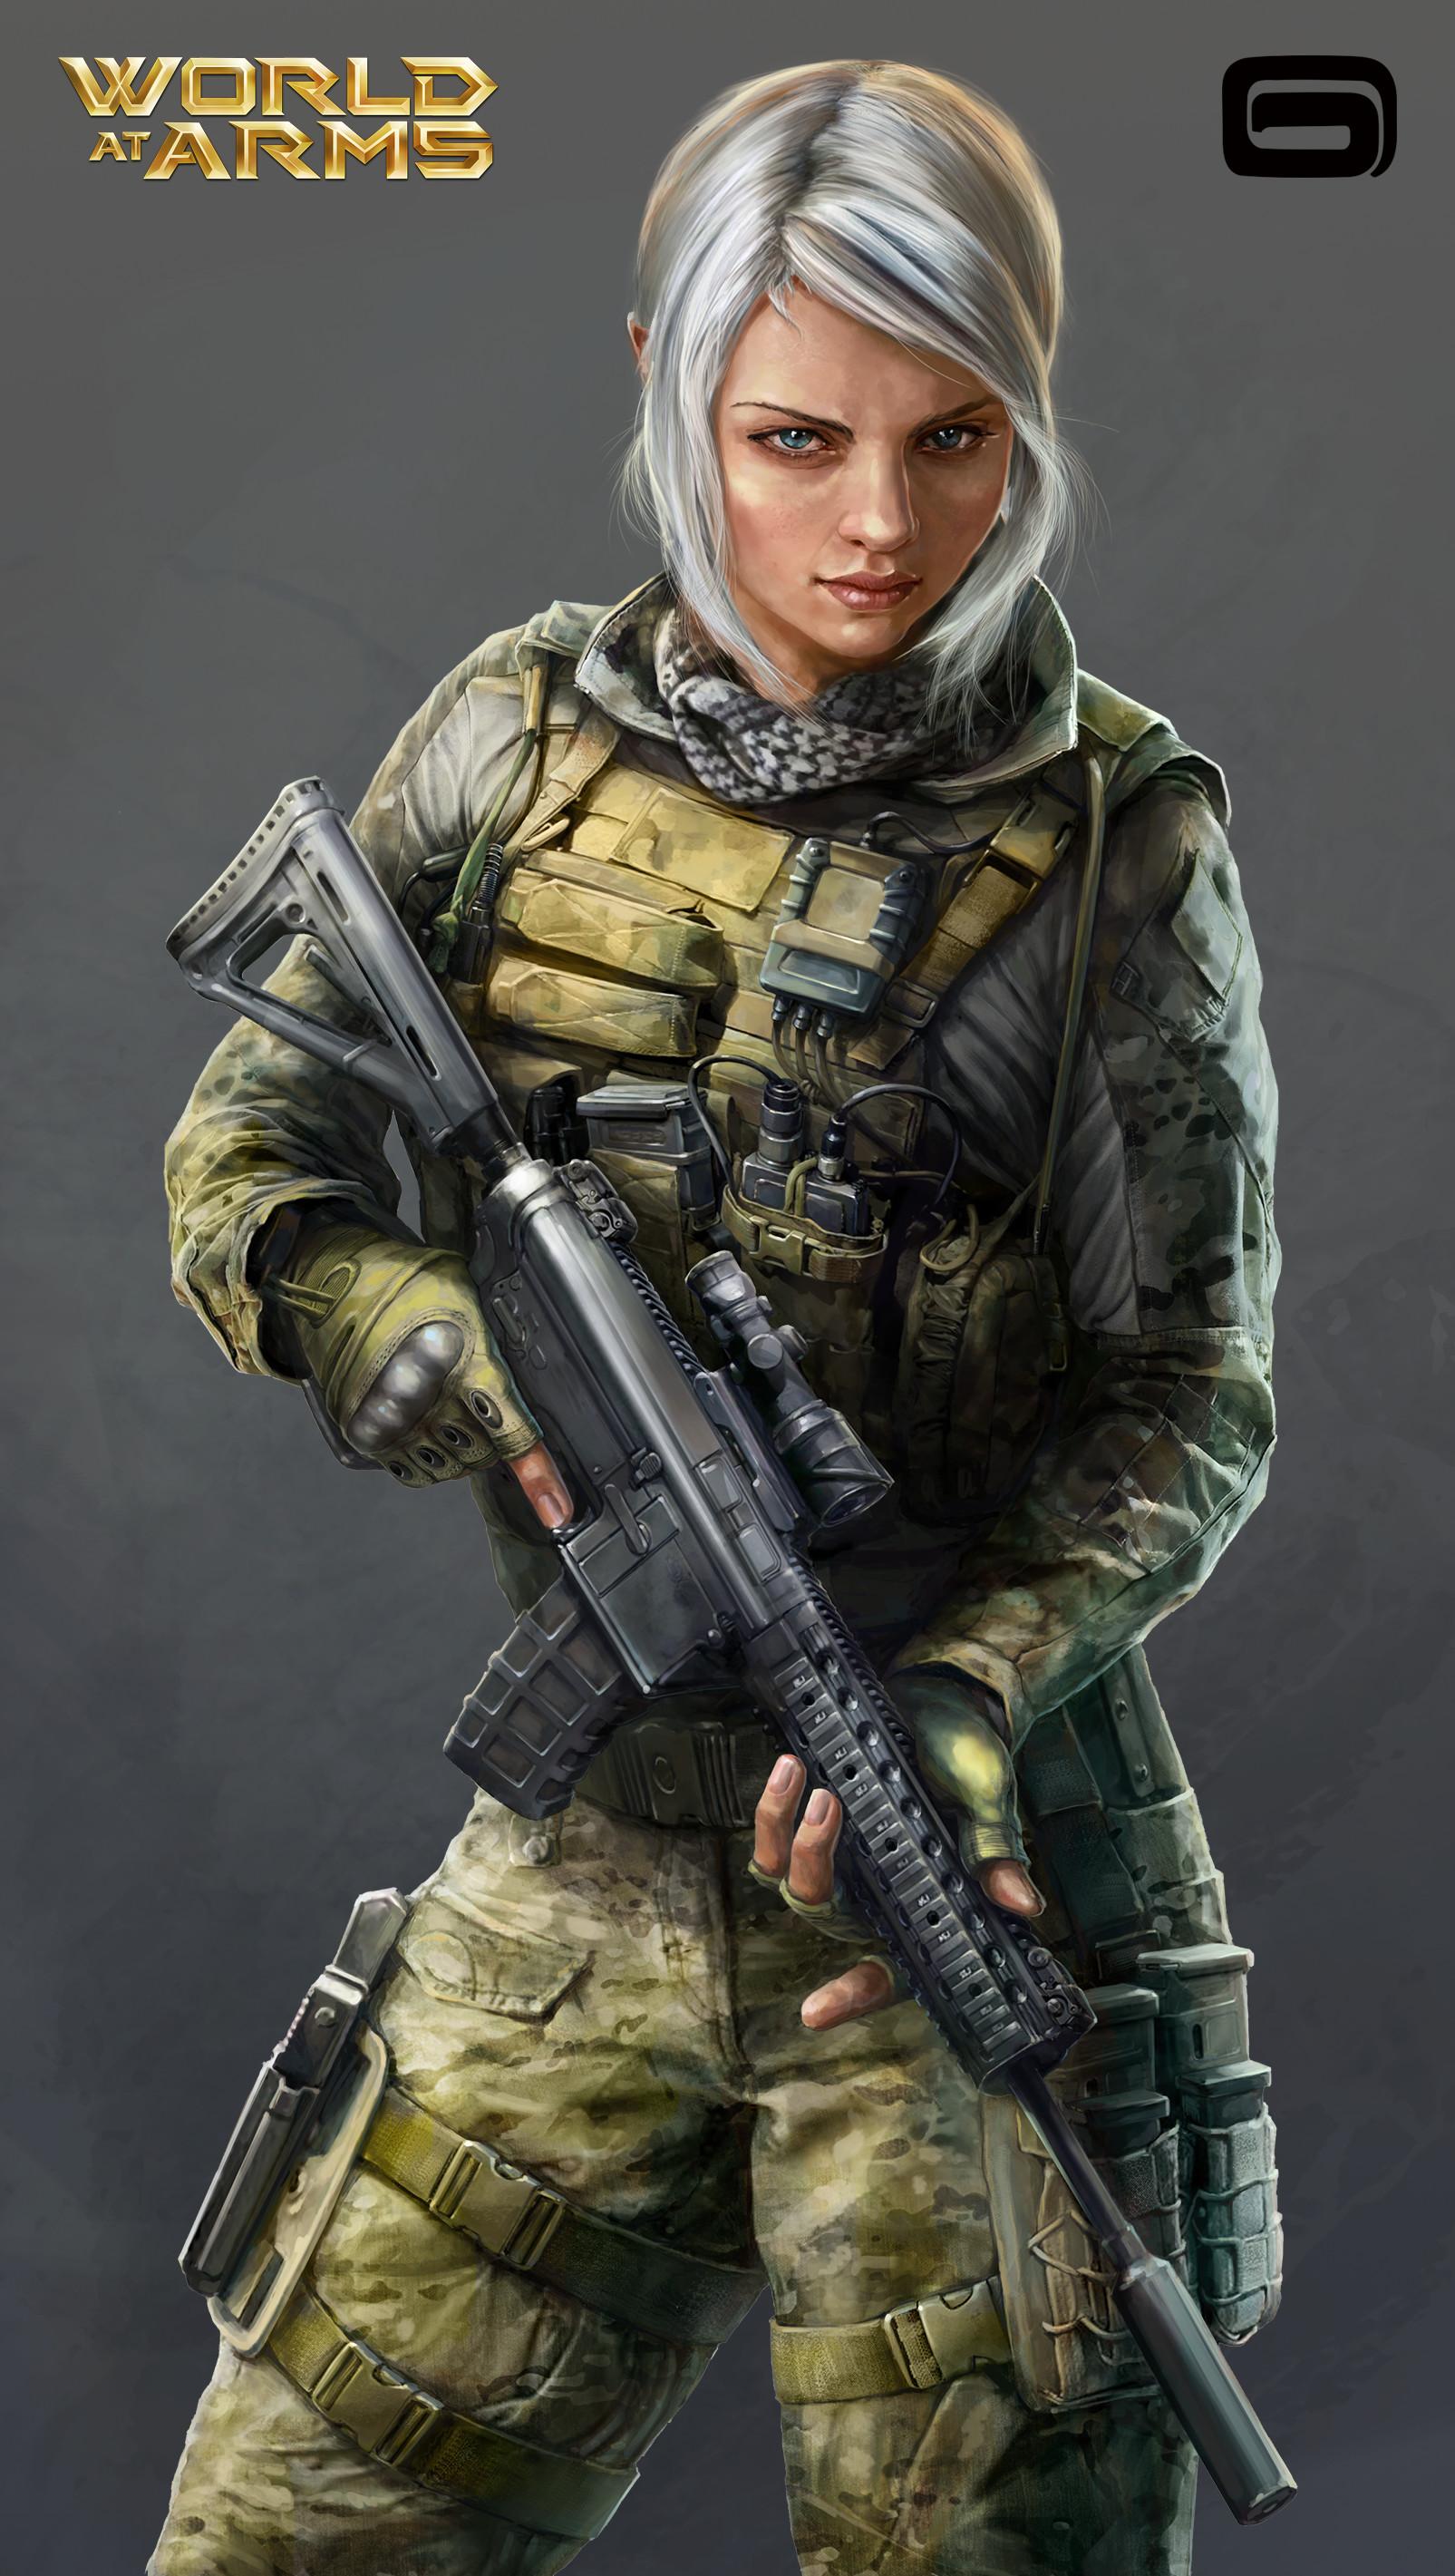 maryna-shcherbakova-angry-fixed-hex-alfa-portfolio.jpg?1497873856